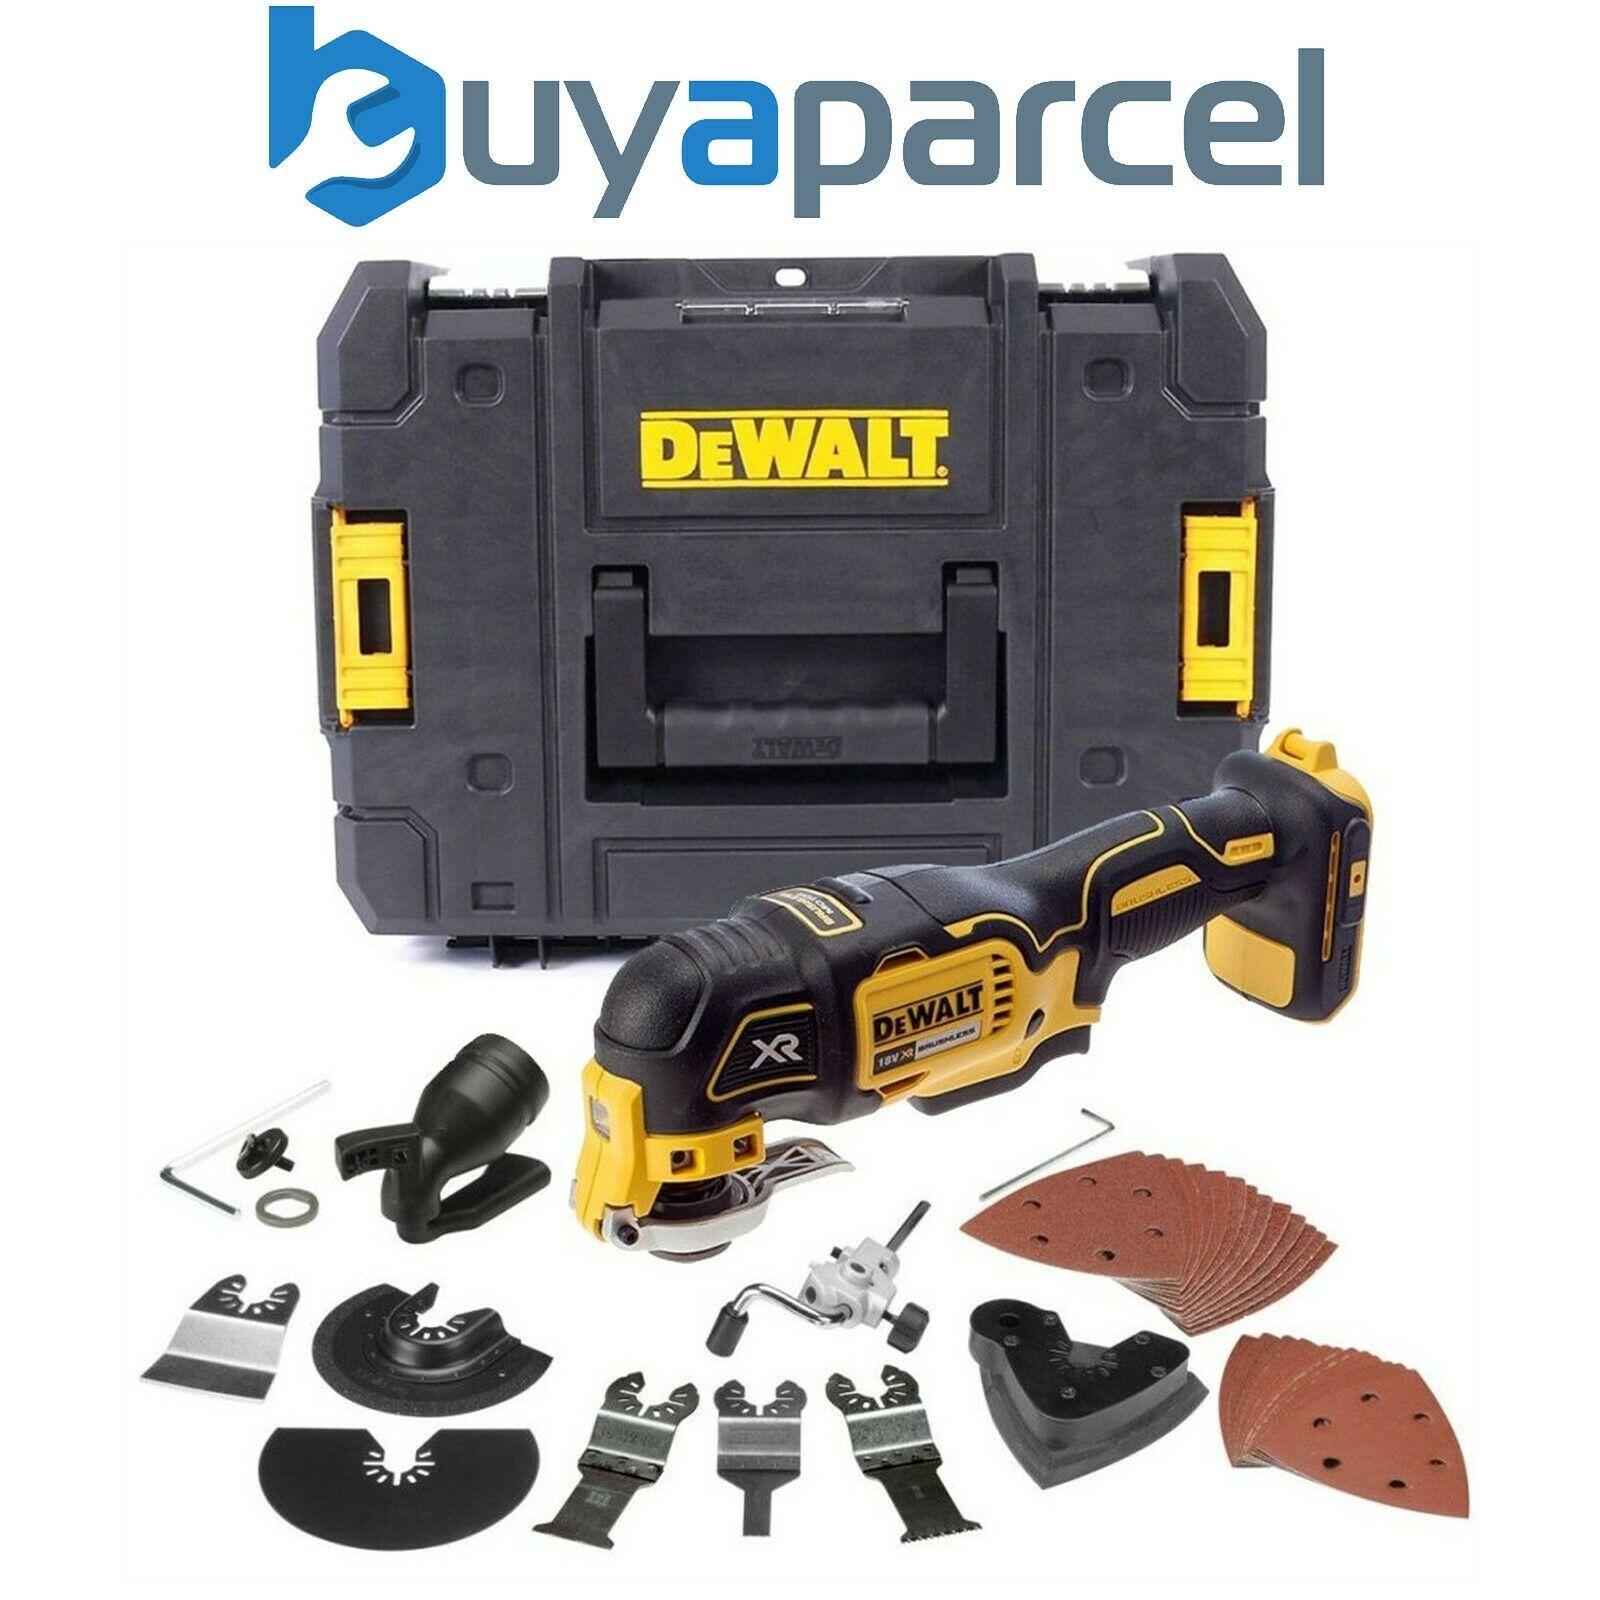 Dewalt DCS355N 18v XR Brushless Oscillating Multi Tool + 35 Accessories + Tstak - 20% to £127.99 @ Ebay  buyaparcel